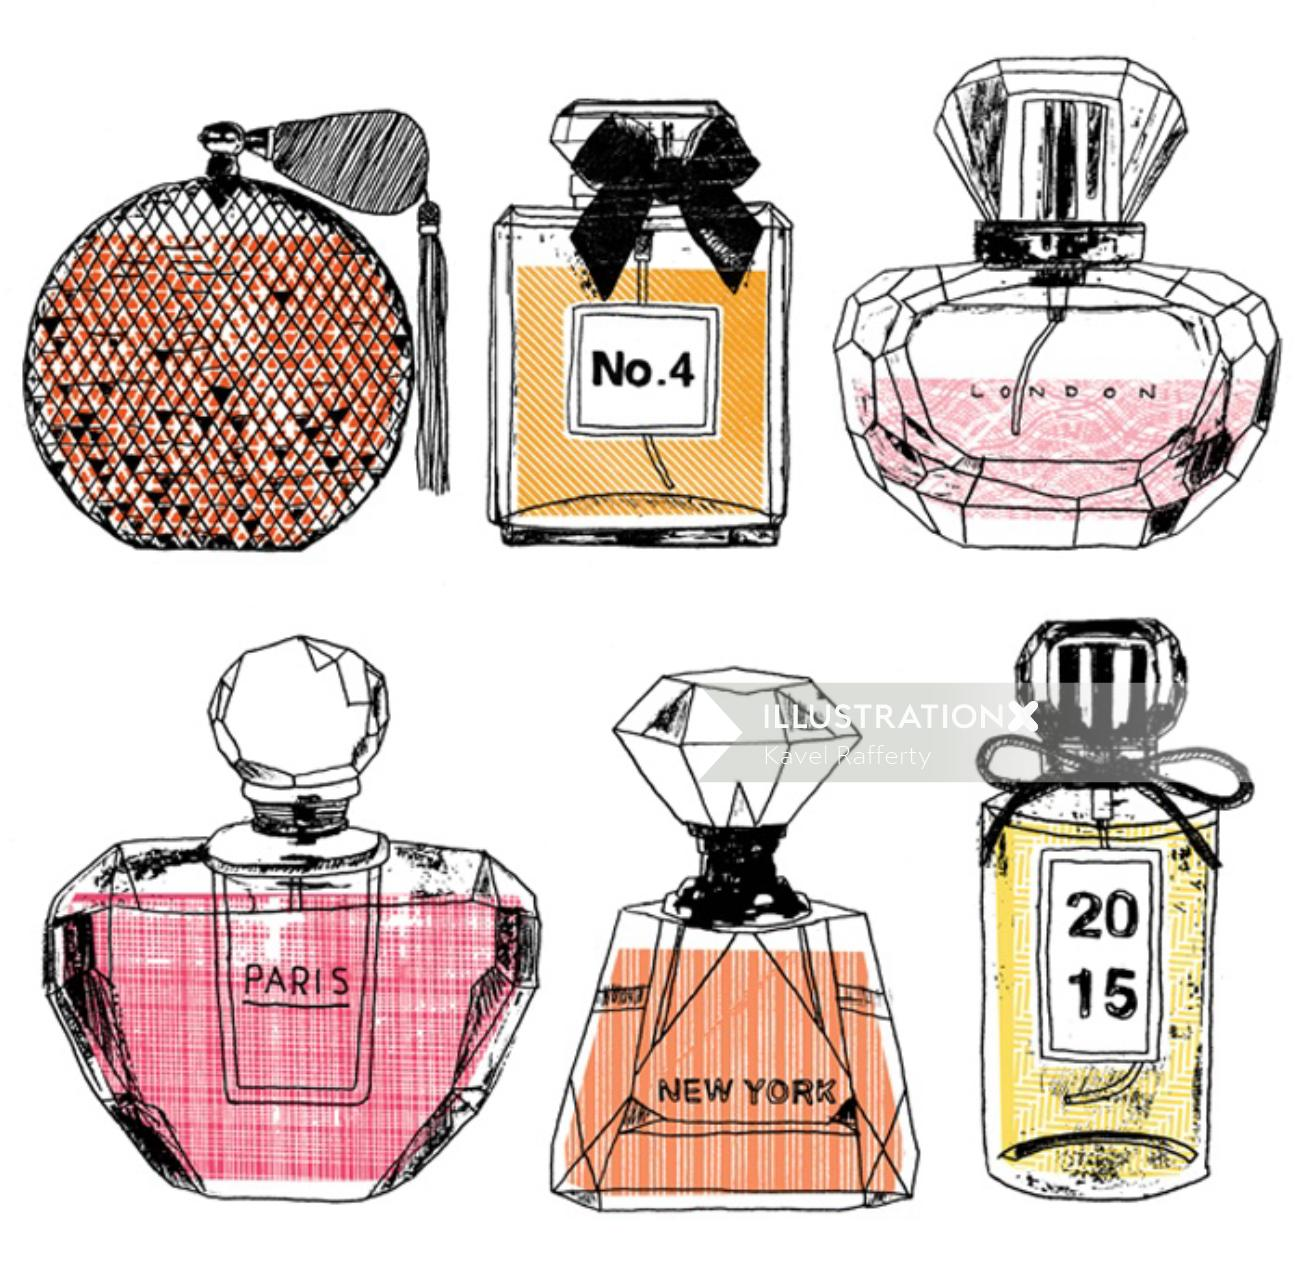 Perfume bottles illustration